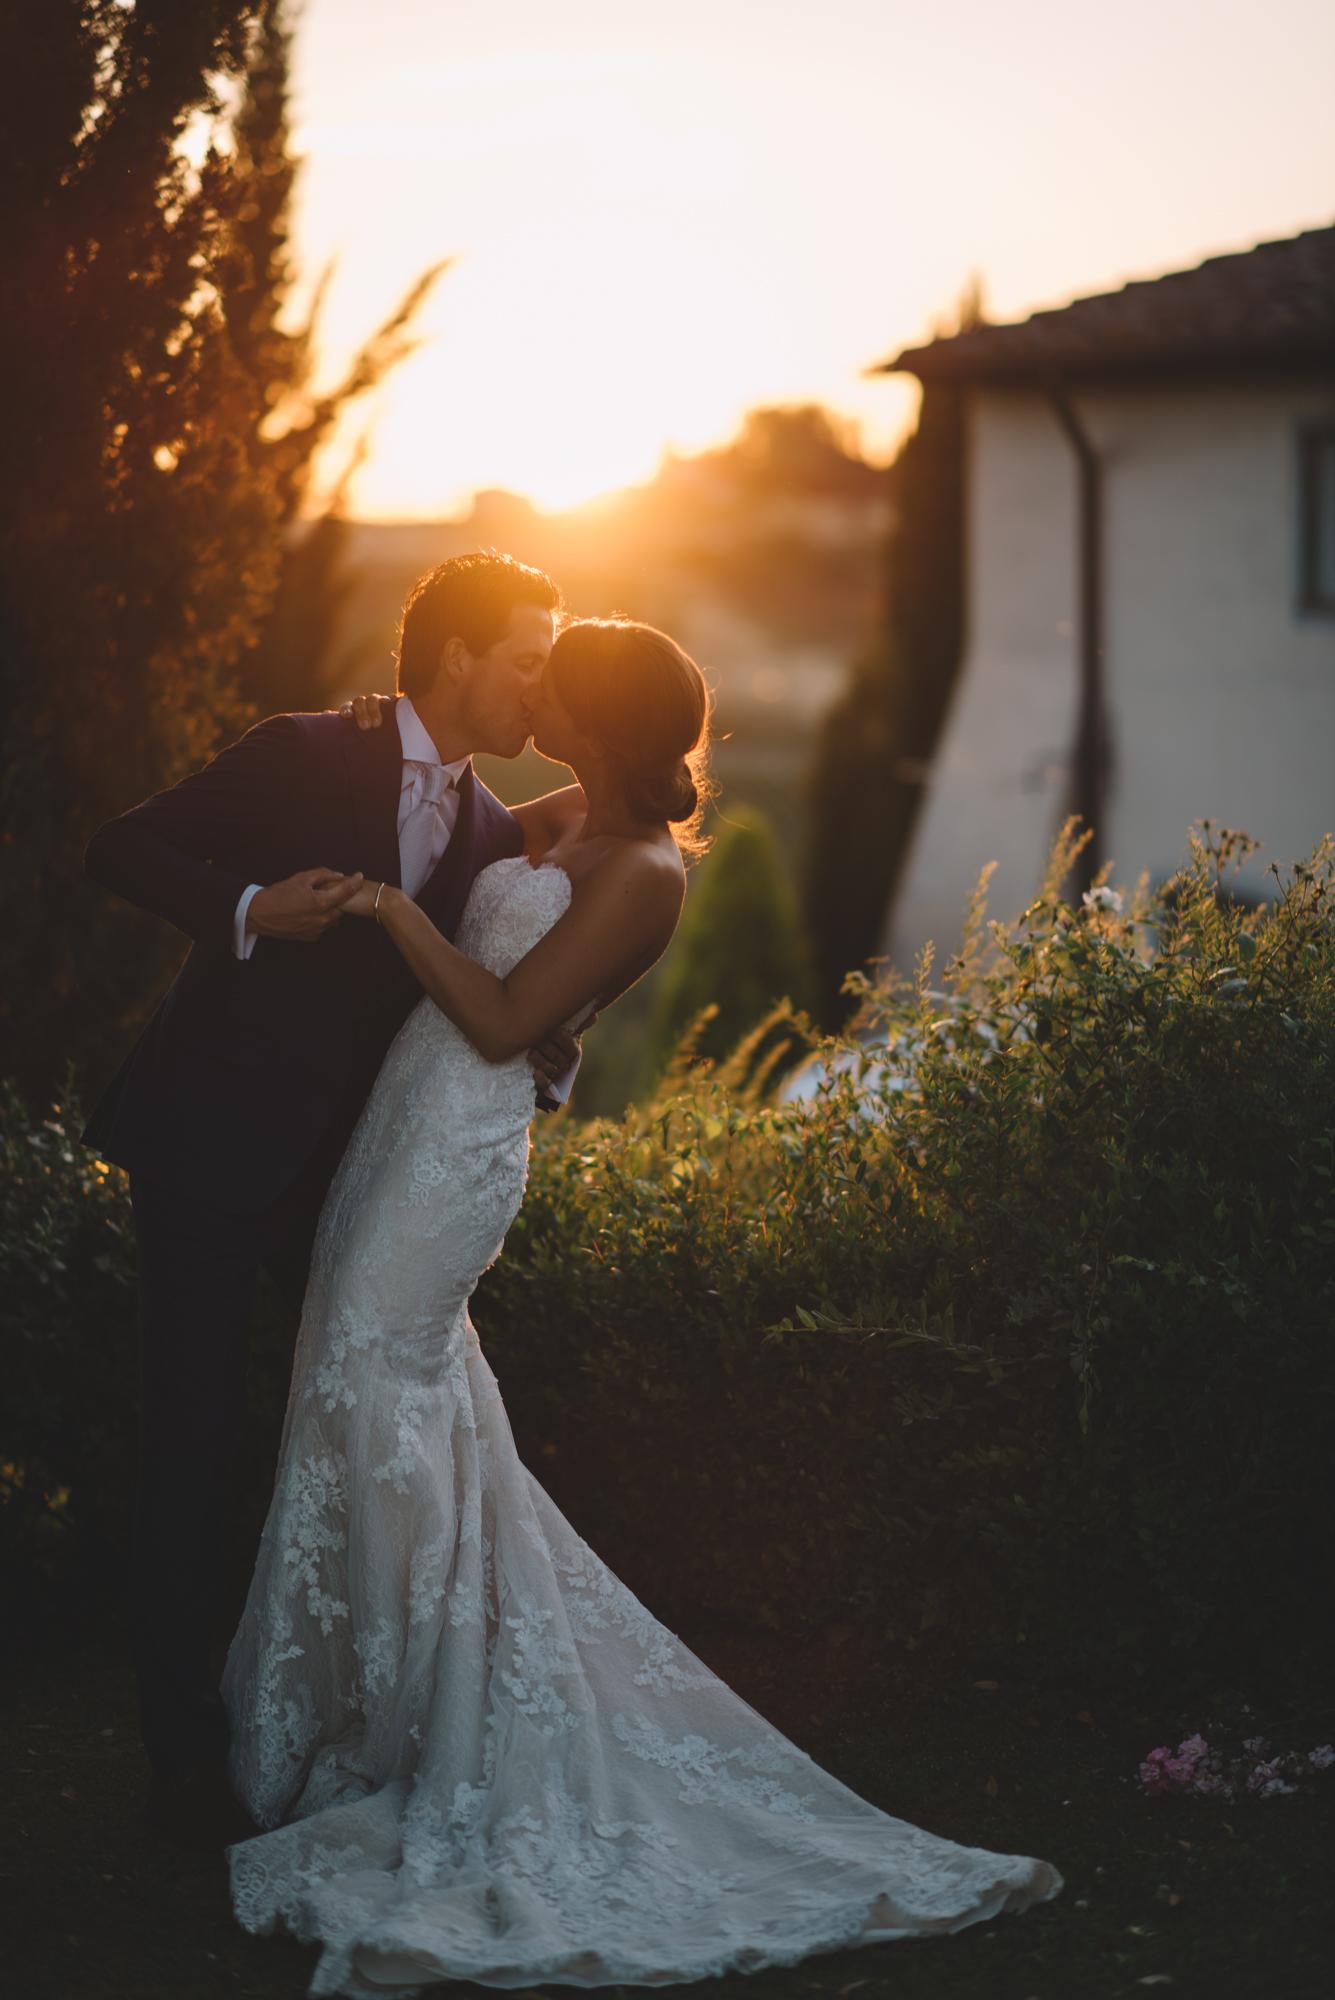 Wedding_Photographer_in_Tuscany_Italy-008.jpg